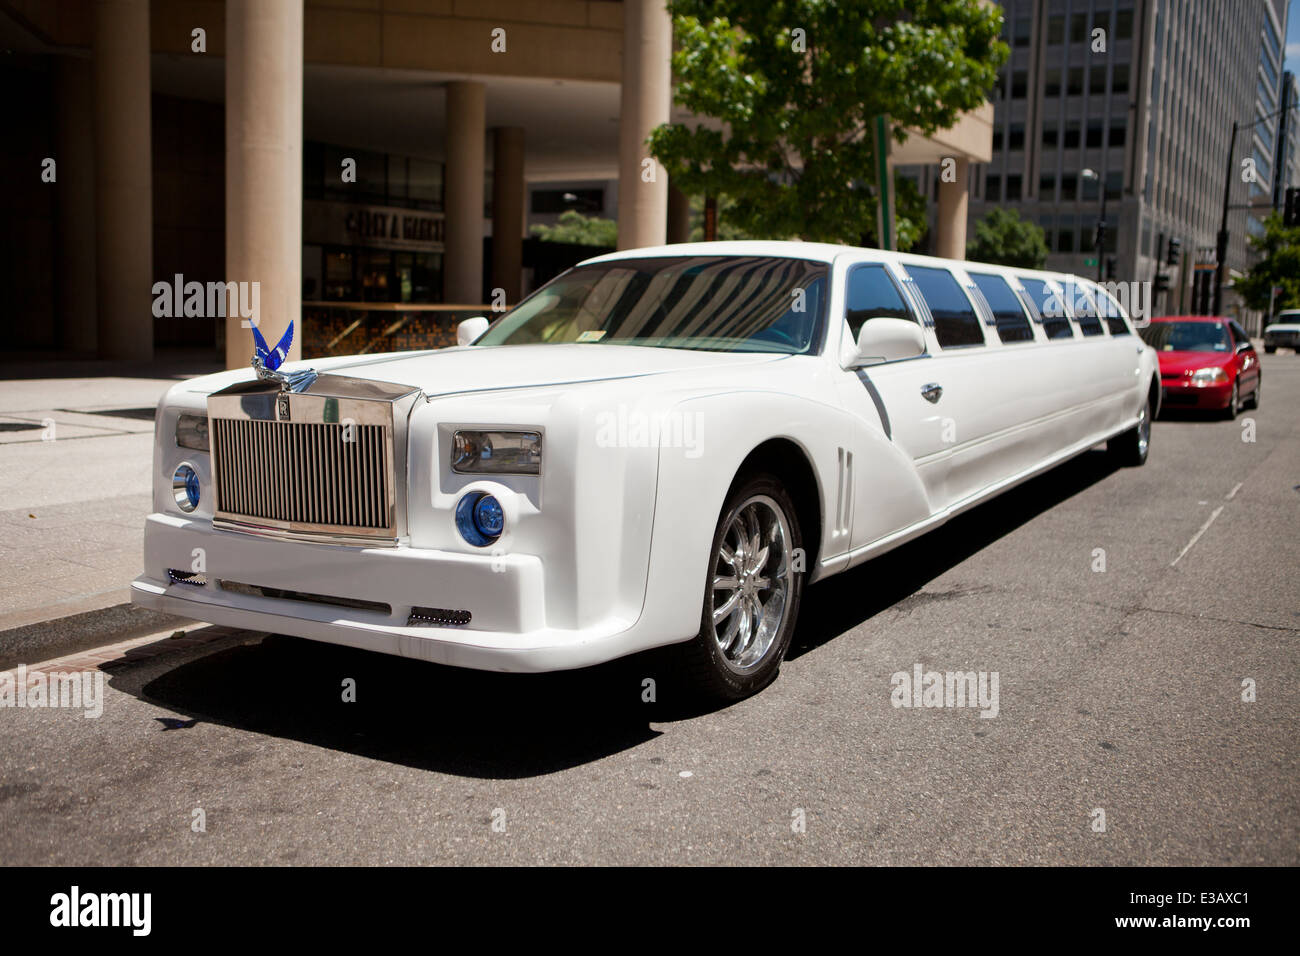 Rolls Royce Stretch Limousine USA Stock Photo 70925681